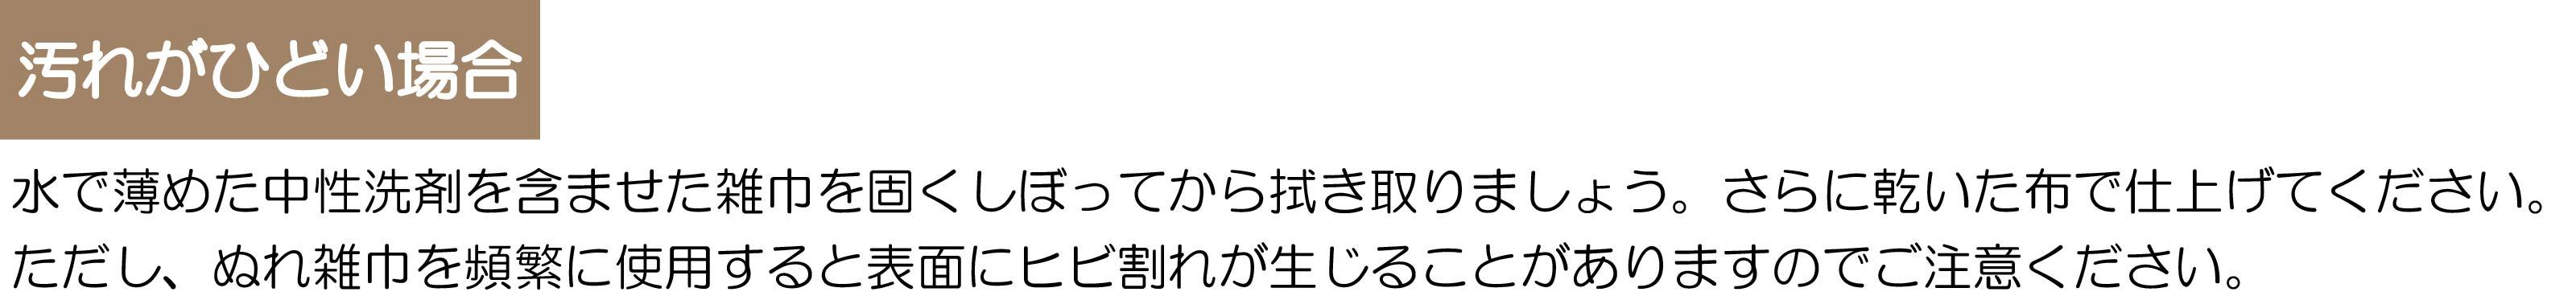 KuraSi-natu-sin85-17.jpg